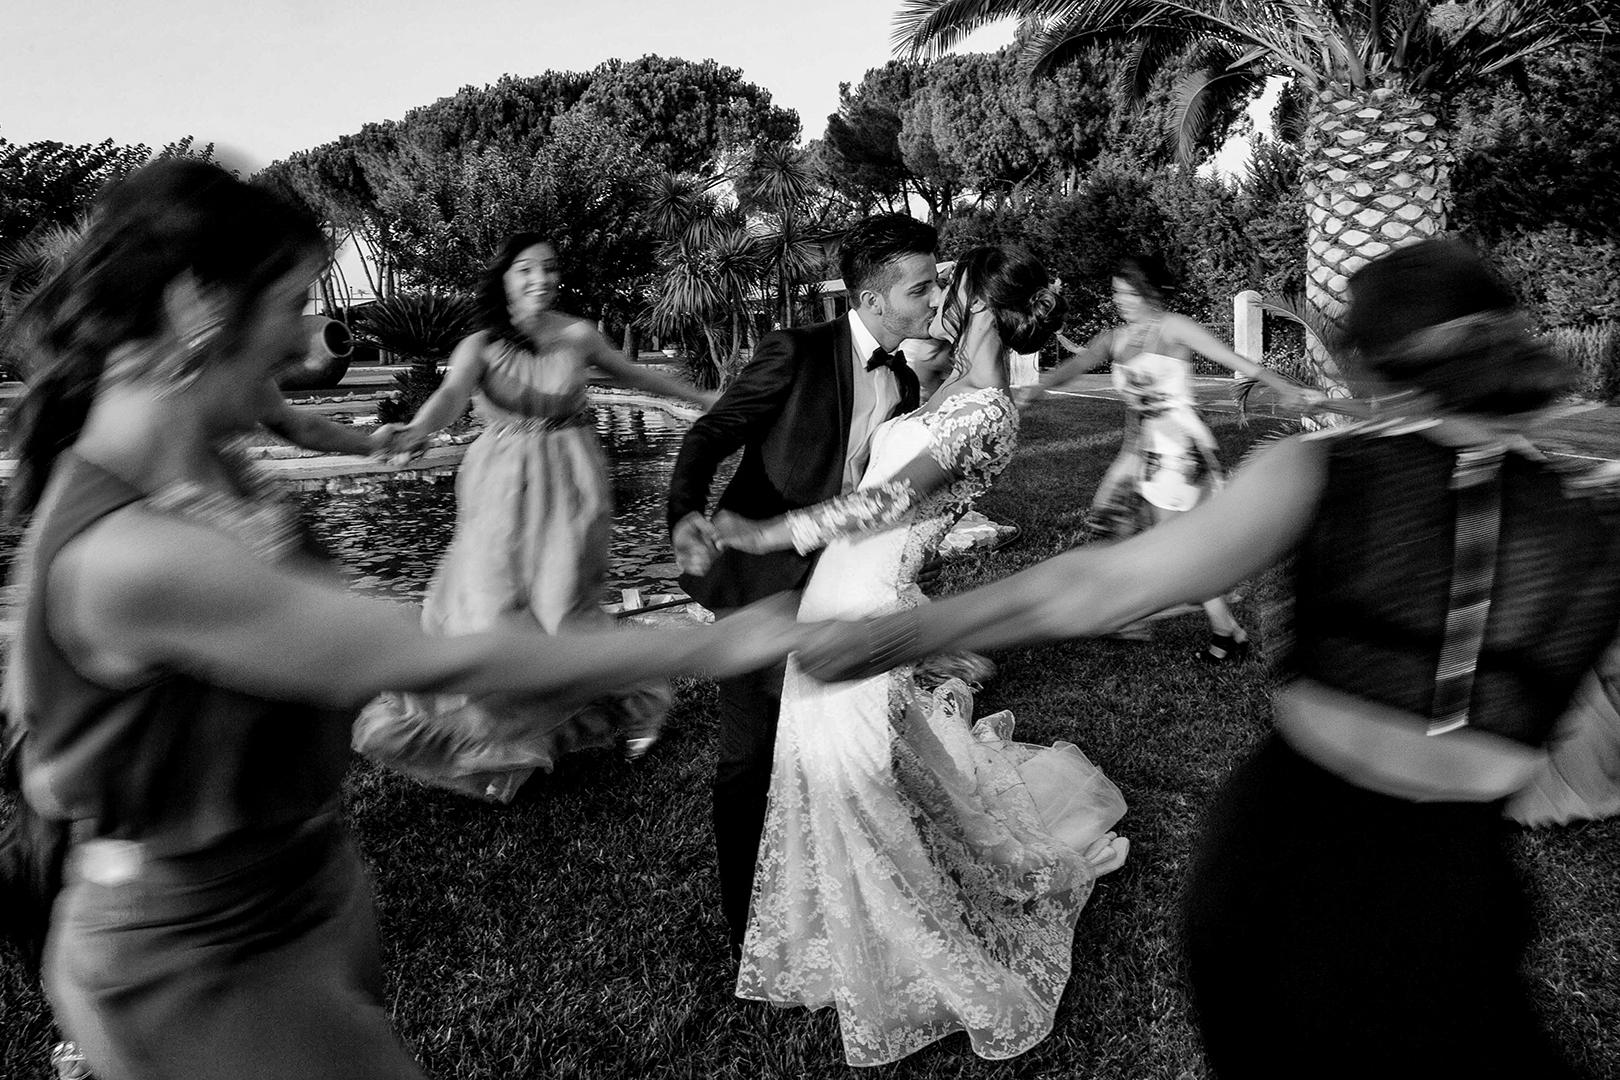 gianni-lepore-painting-matrimonio-wedding